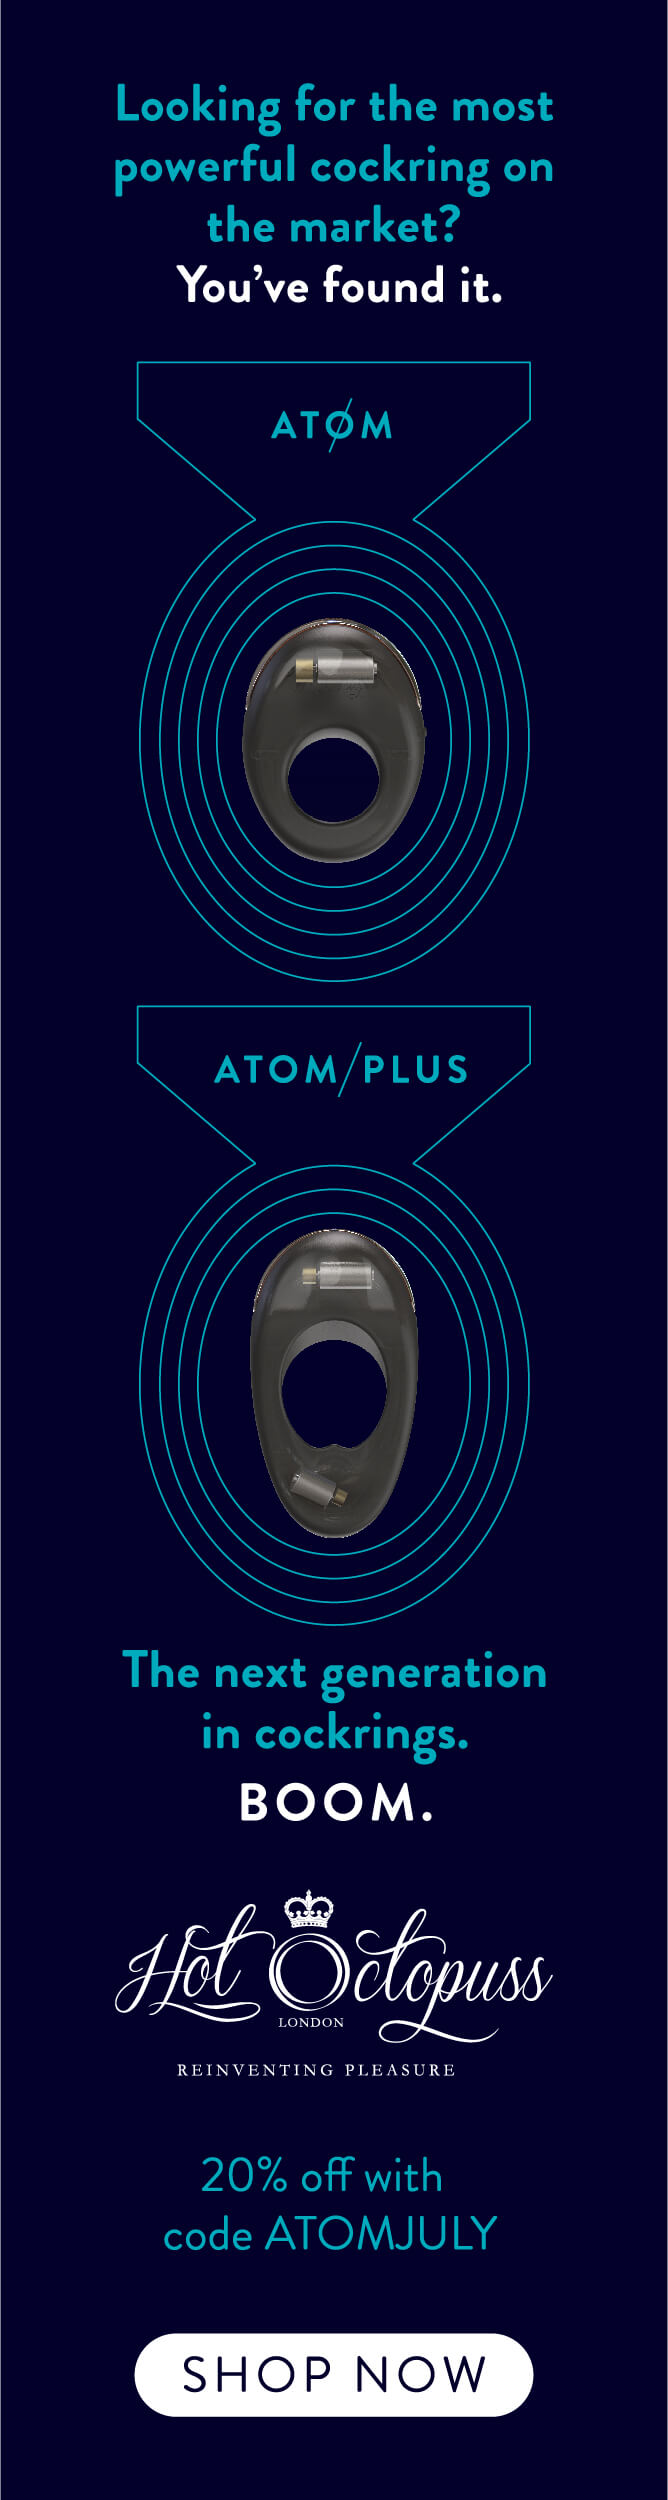 ATOM-sale-160x600-banner.jpg